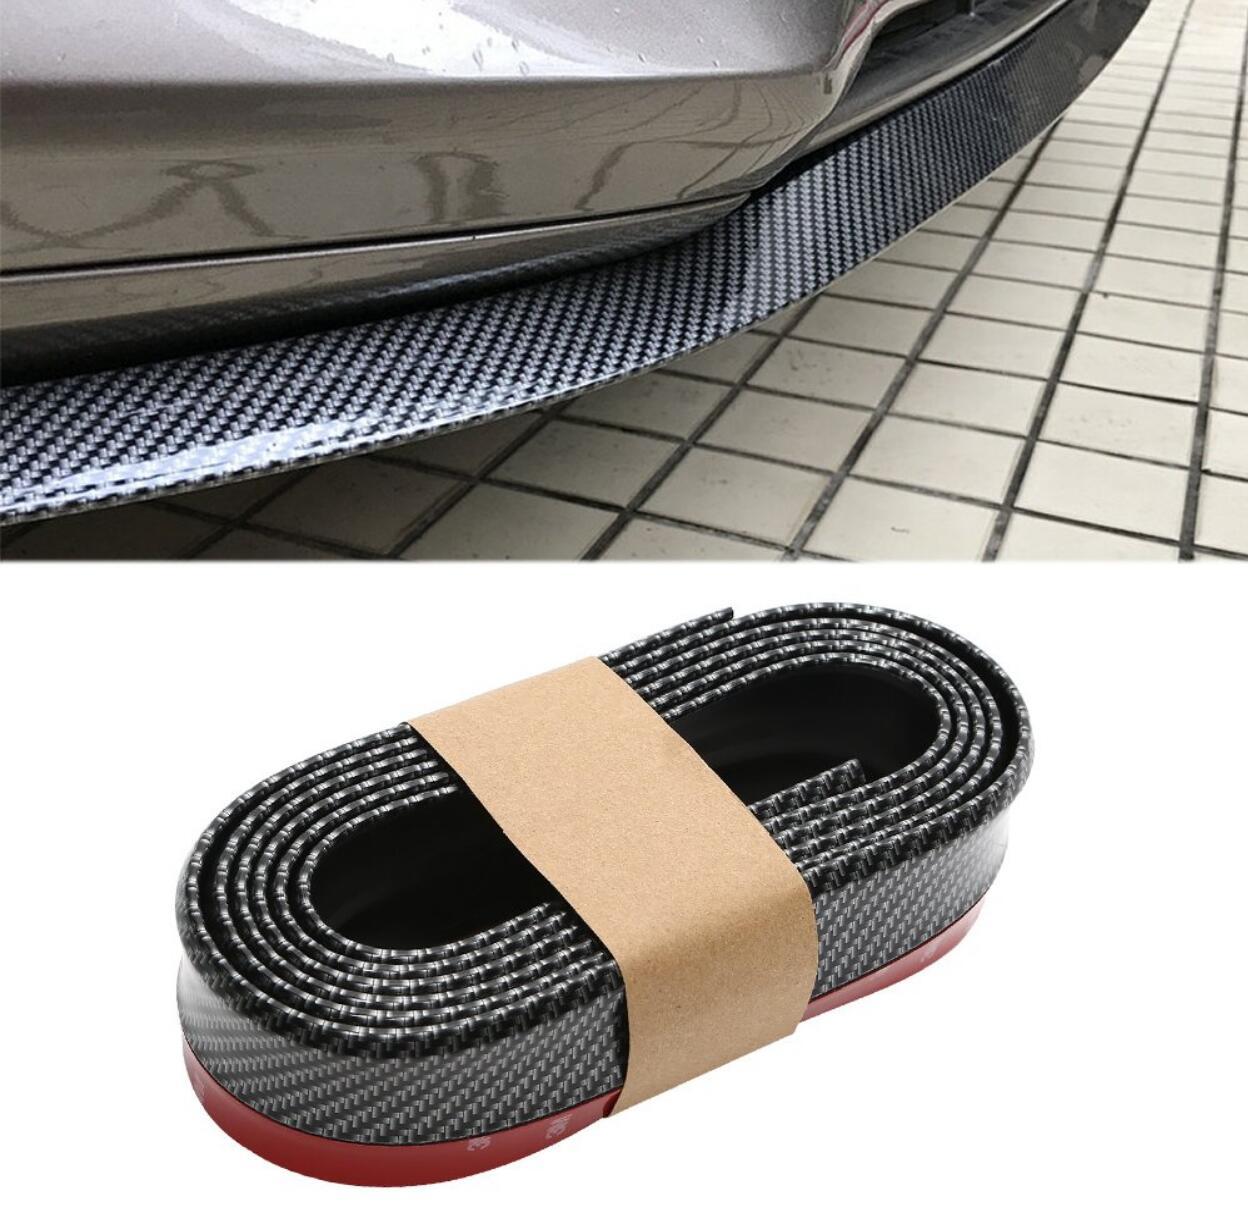 2,5 м Автомобильная Передняя юбка для губ обшивка кузова передний бампер для Subaru Forester Outback датчик для Impreza XV BRZ